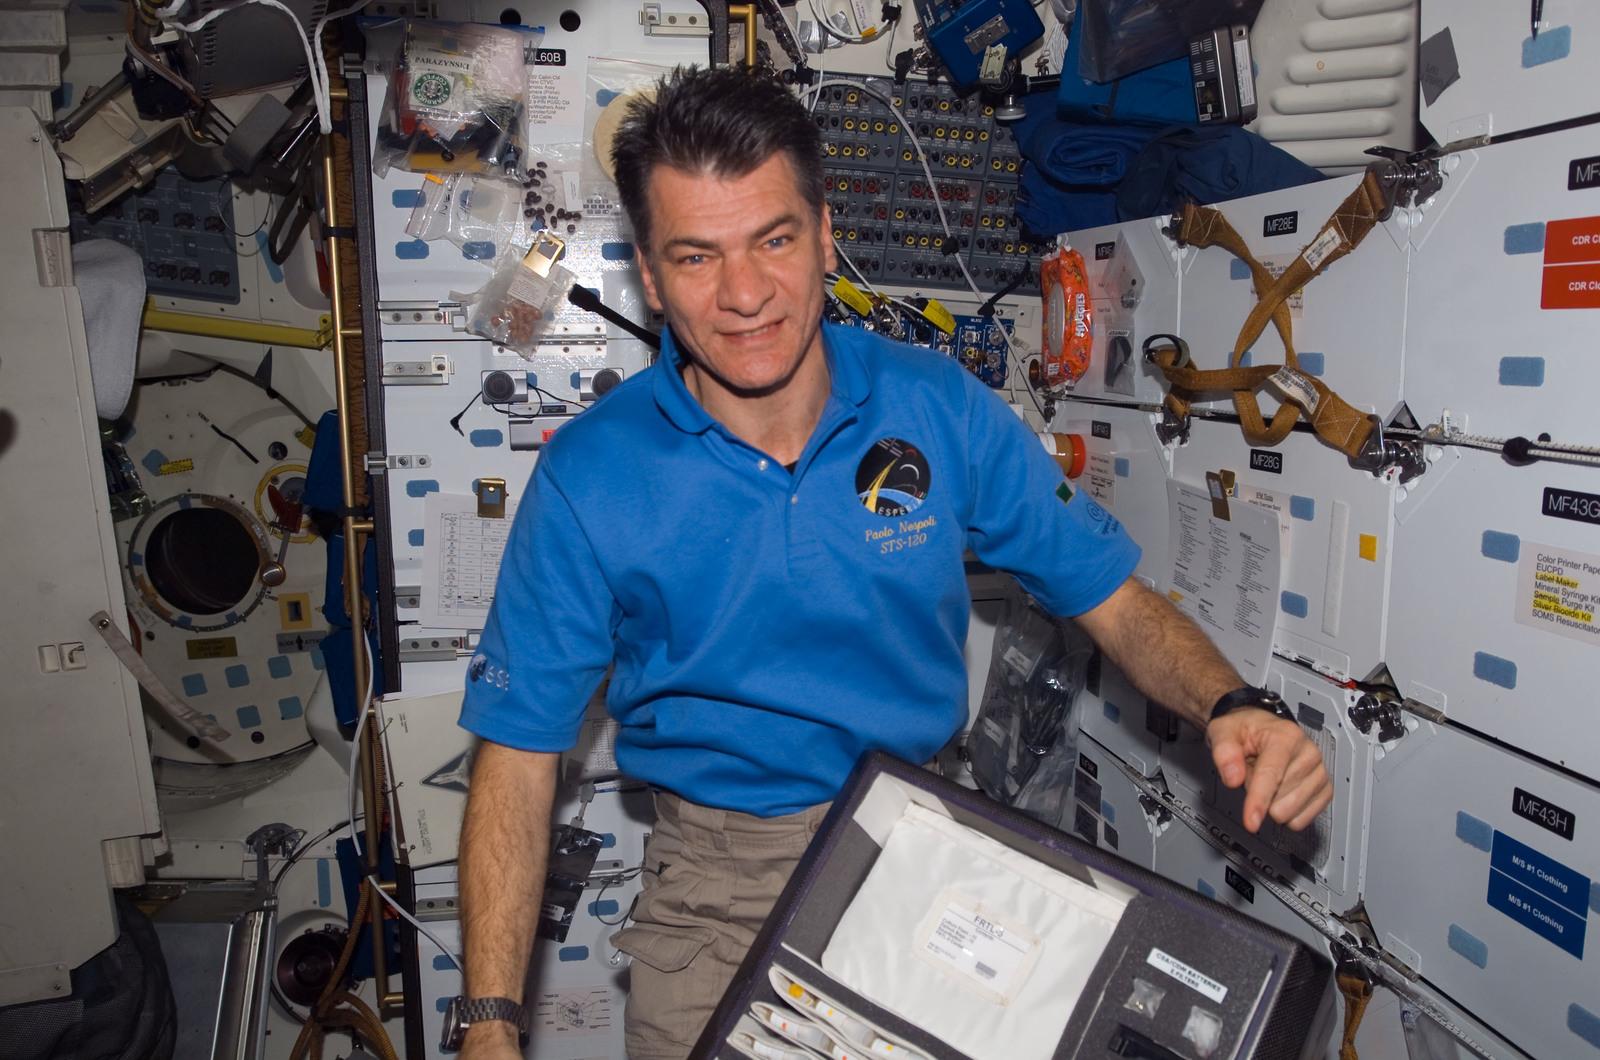 S120E008235 - STS-120 - Nespoli on middeck with locker